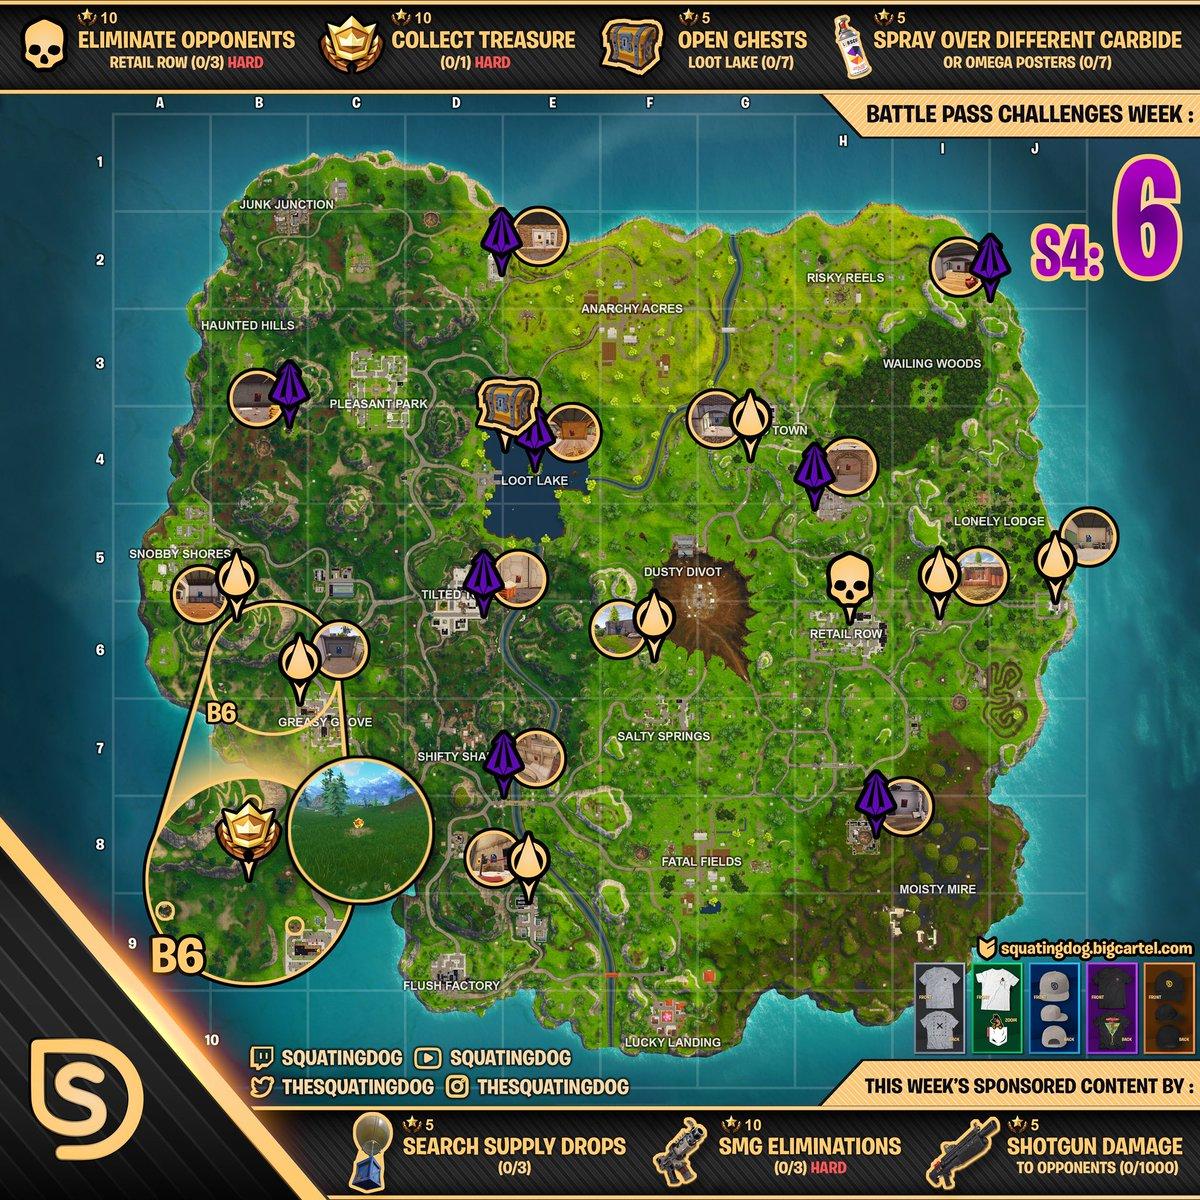 Week 6 Fortnite Cheat Map Fortnite Mobile Hack Ios Download